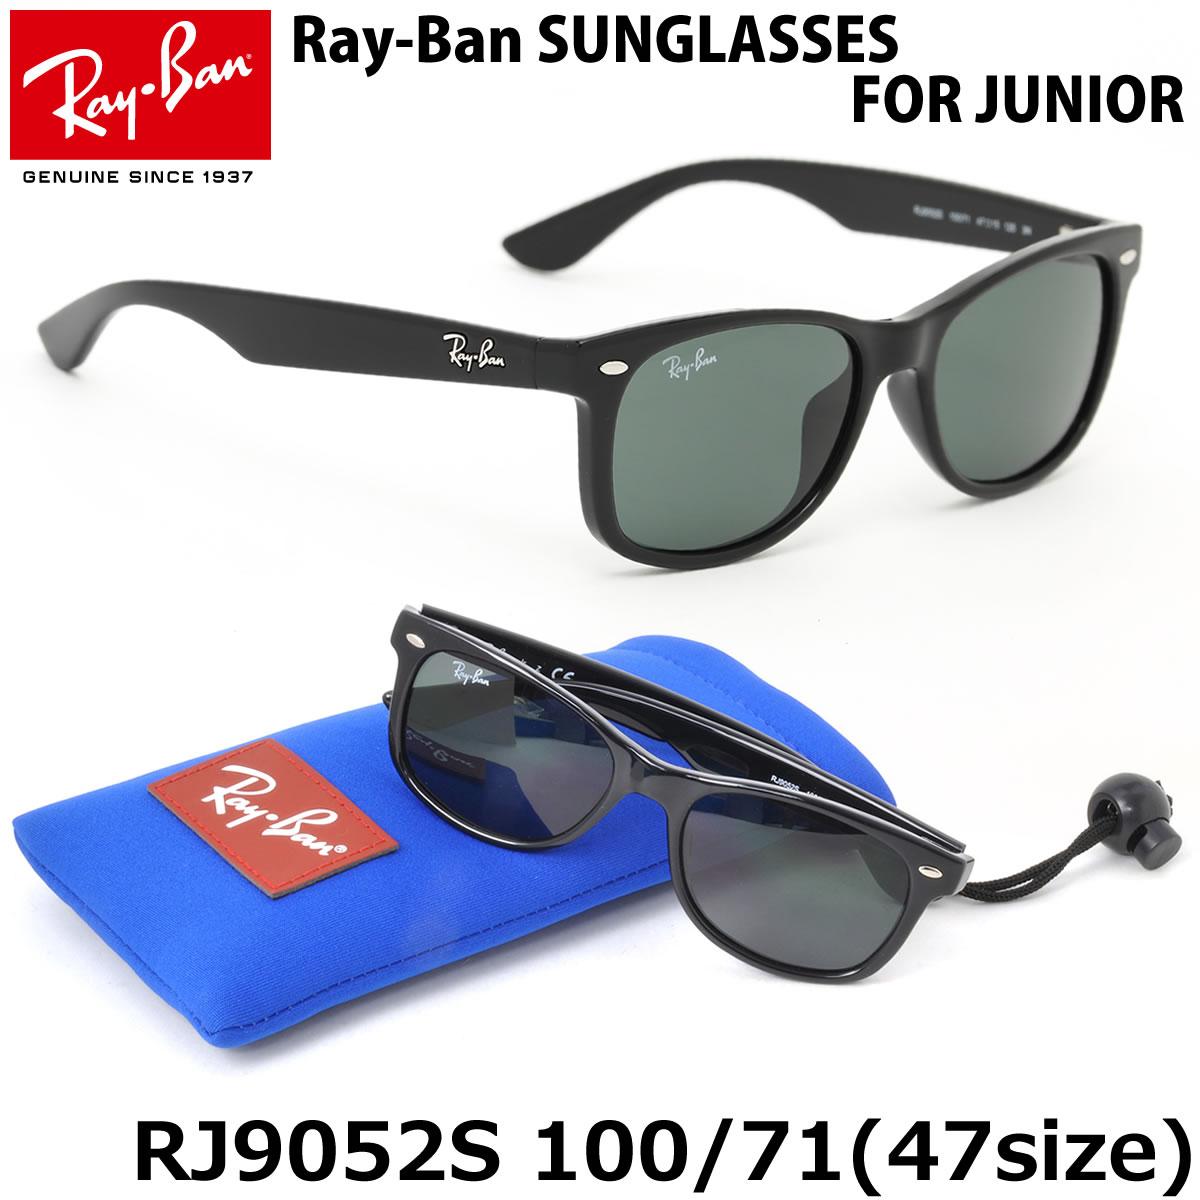 7aca0ff0c768e1 (Ray-Ban) junior new Wayfarer sunglasses RJ9052S100 71 47 size children s  Ray-Ban WAYFARER RAYBAN Junior NEW kids for kids